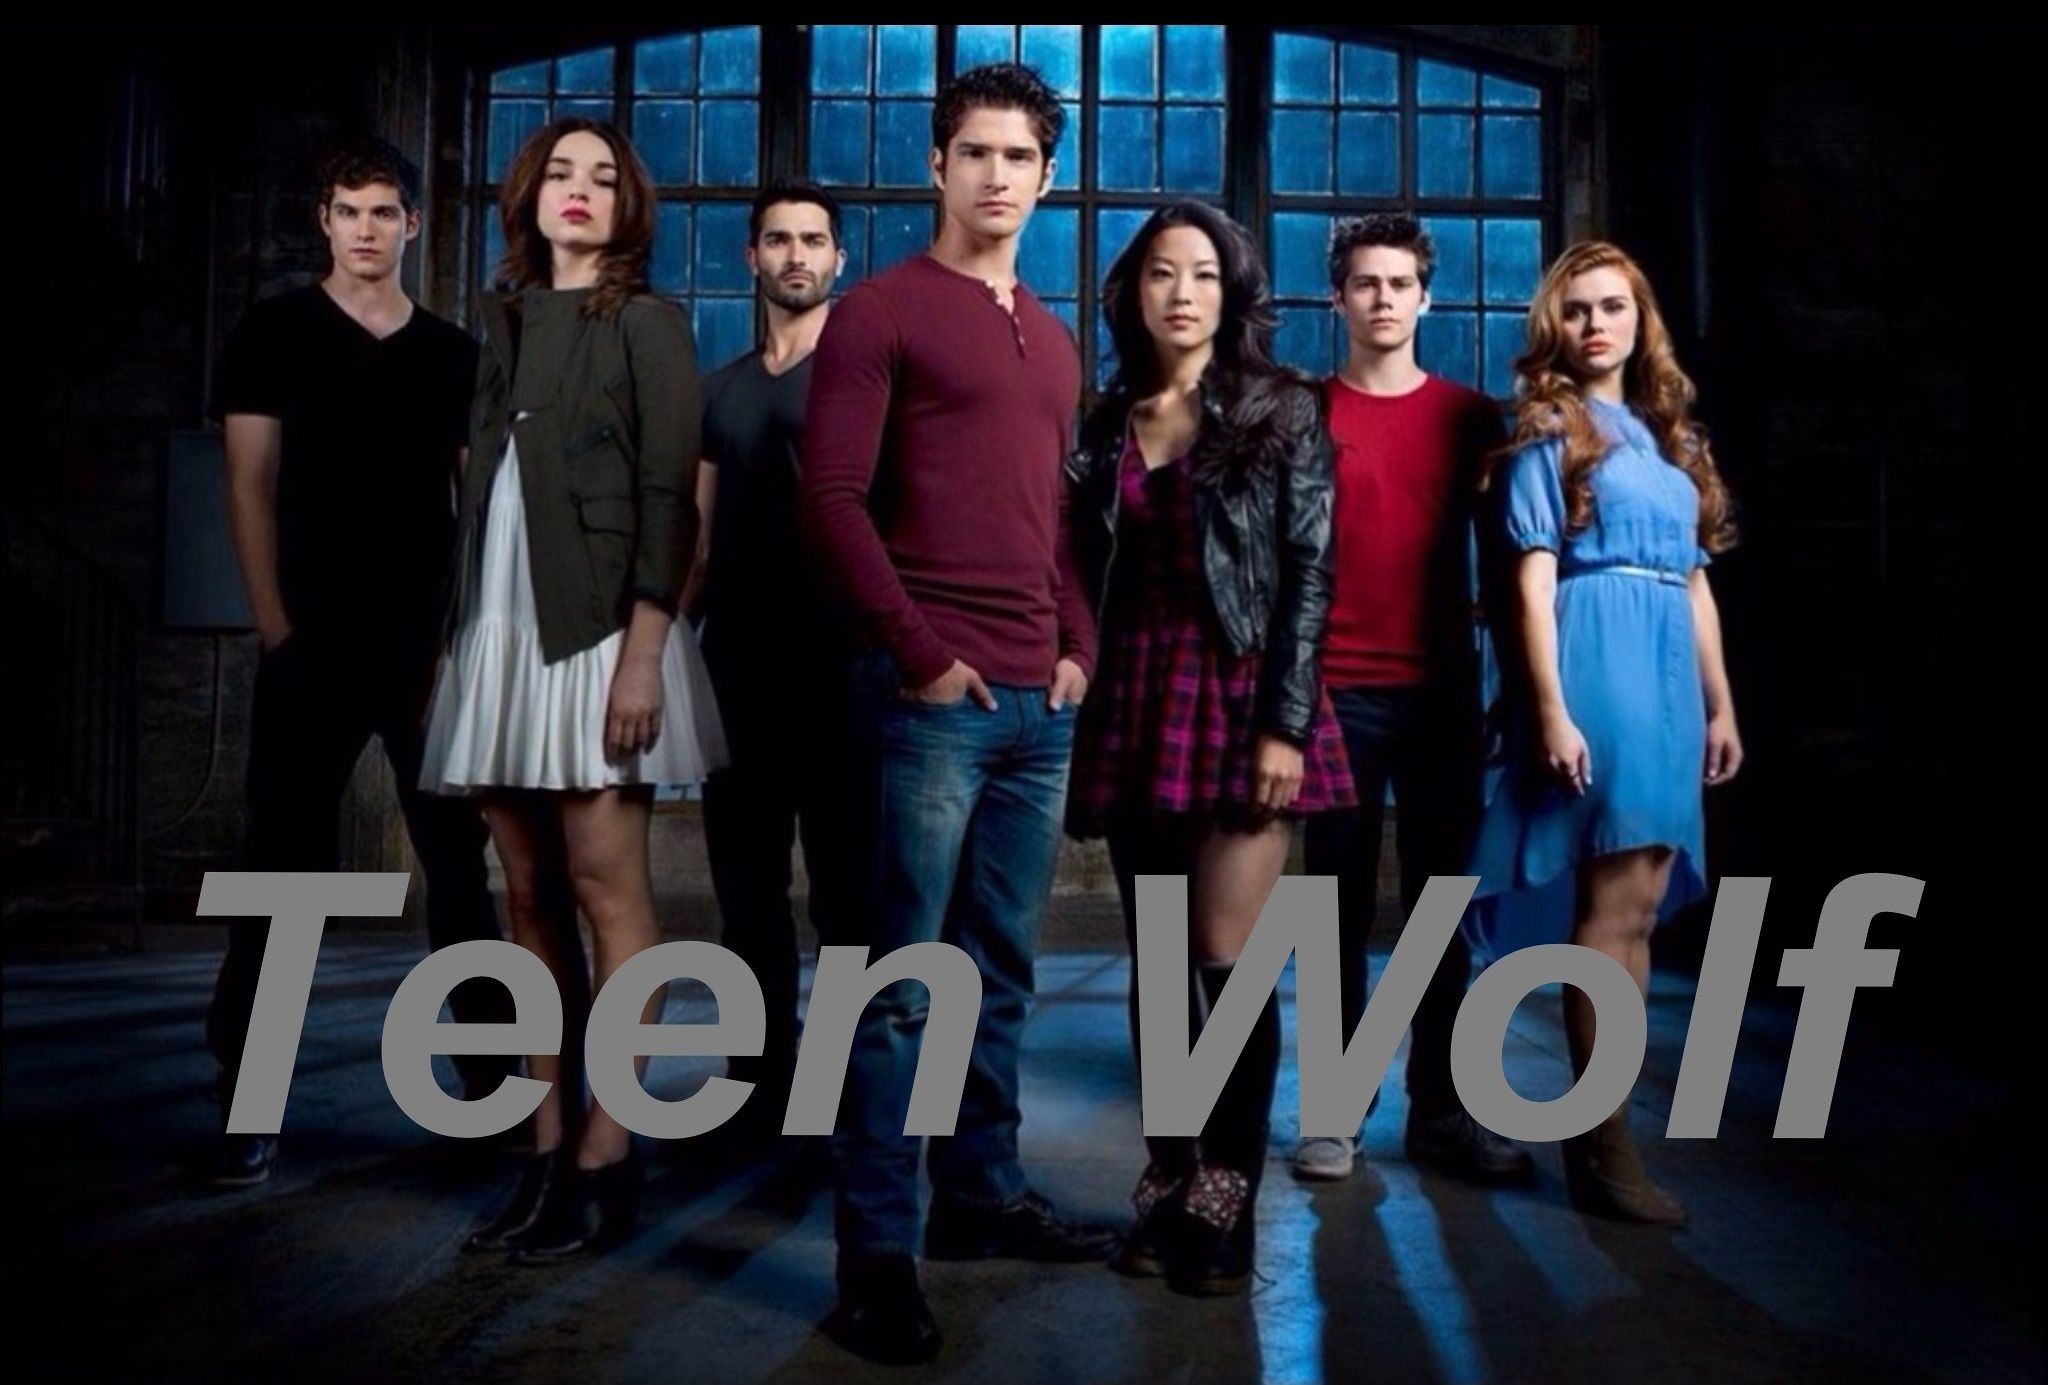 دانلود فصل سوم سریال Teen Wolf با زیرنویس فارسی